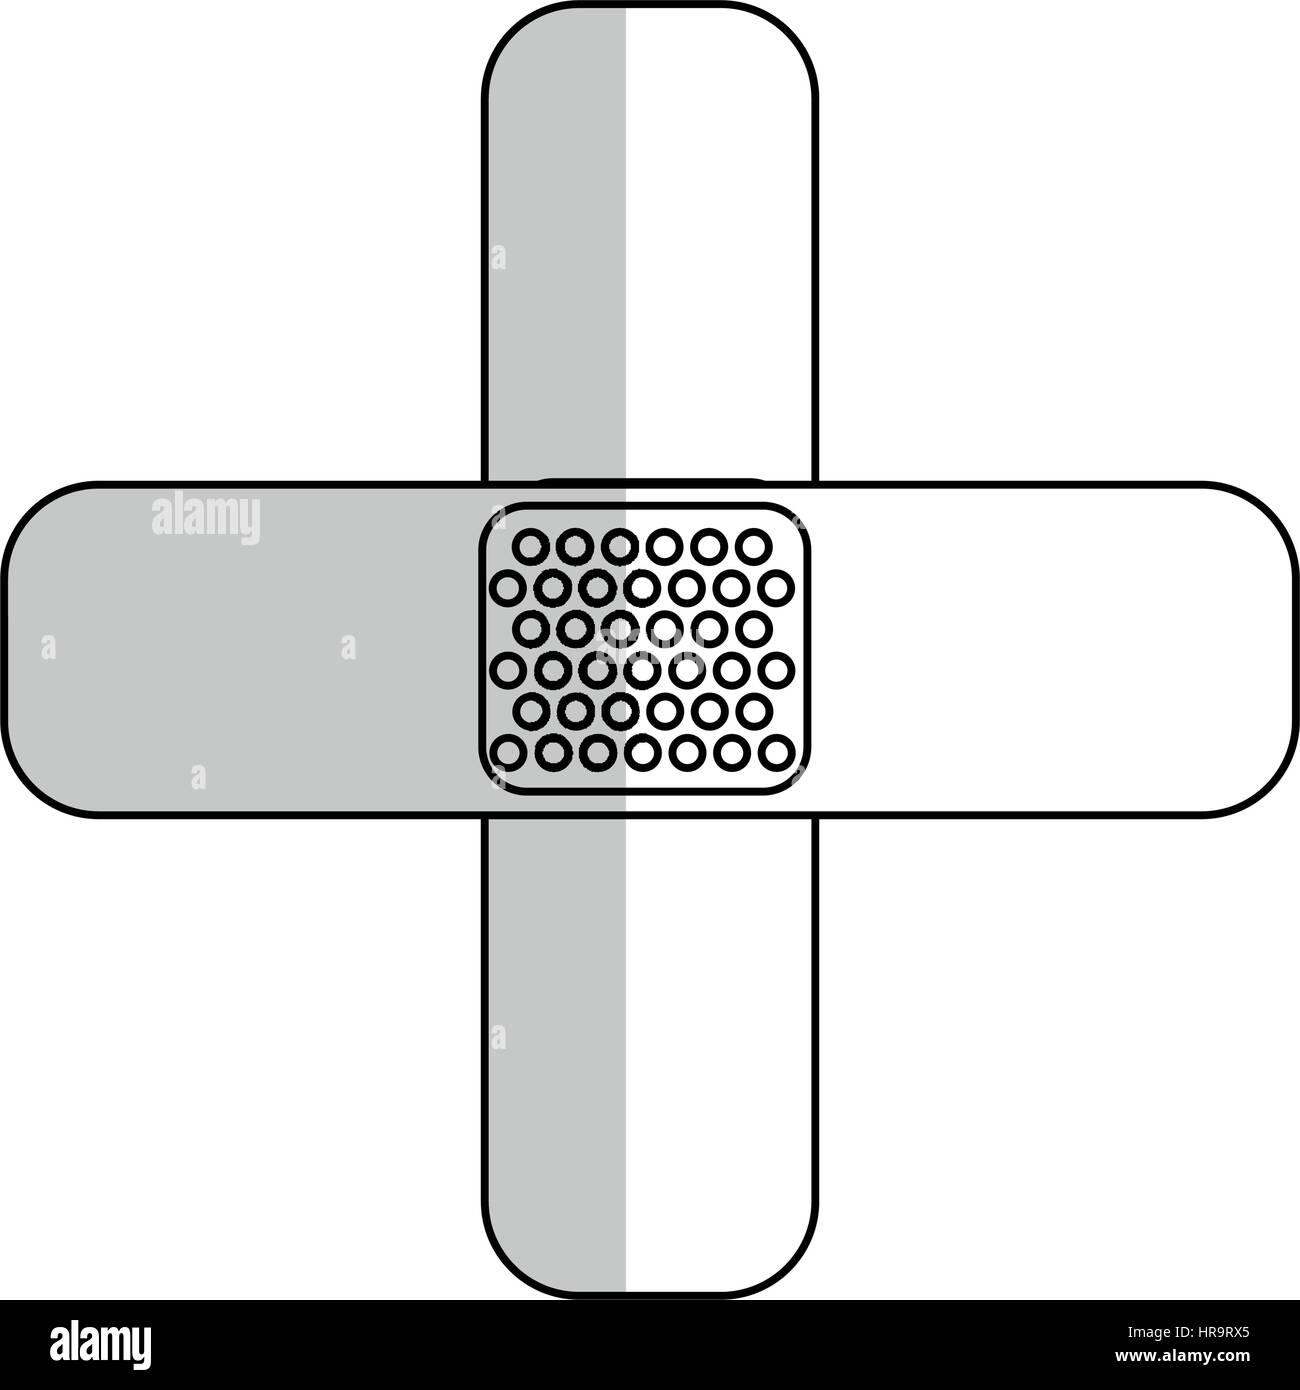 ban aid icon - Stock Image